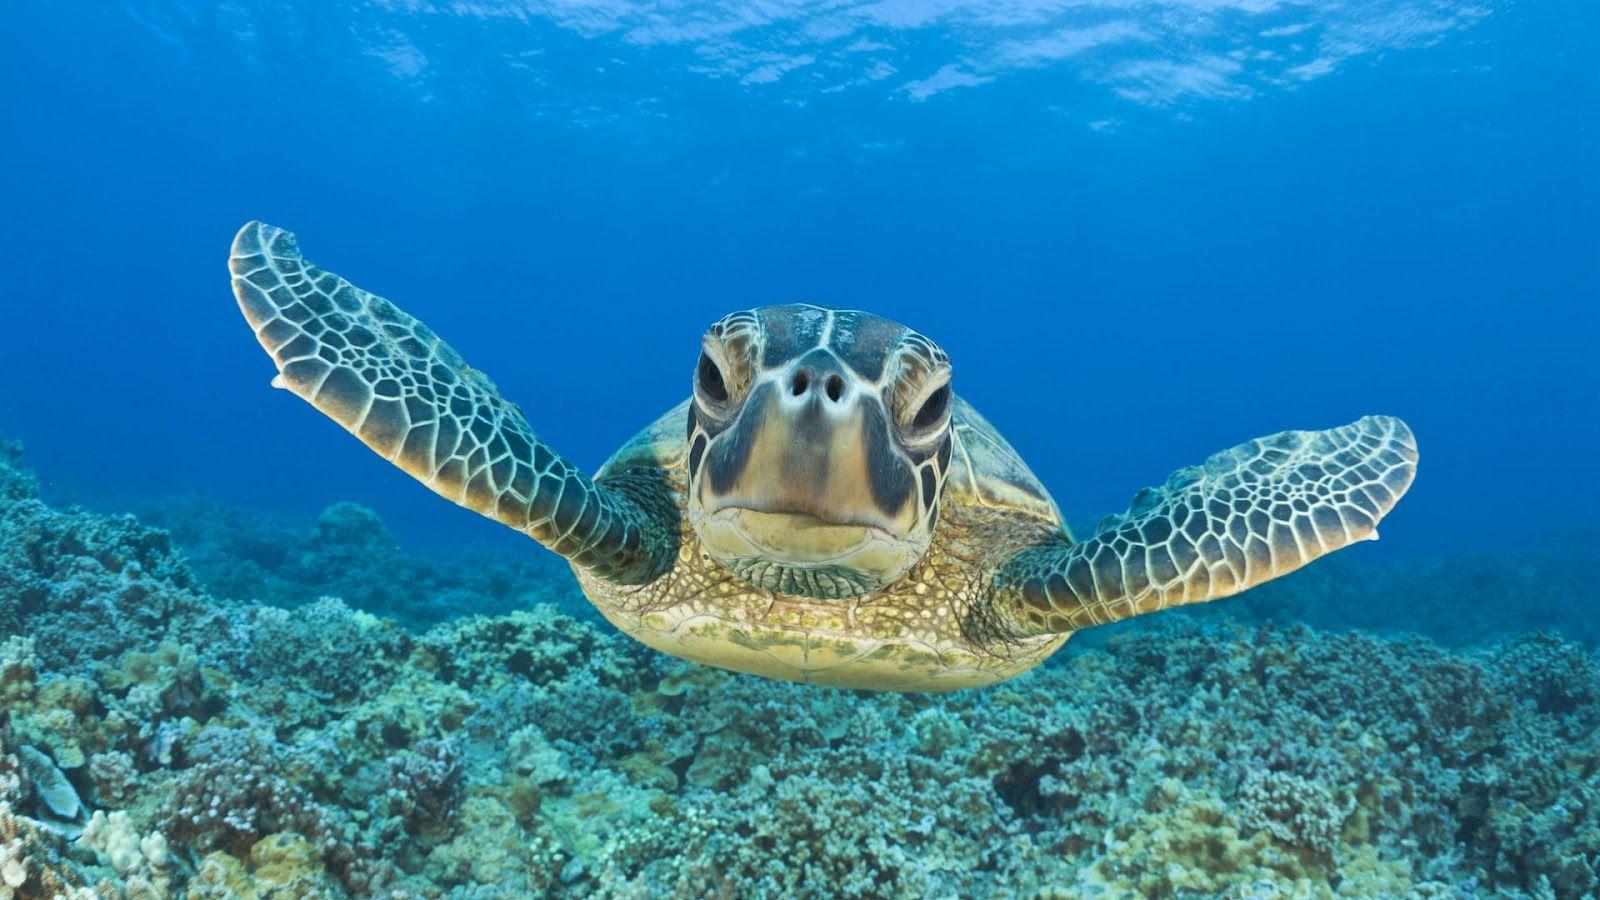 Tropical HD Underwater Wallpaper